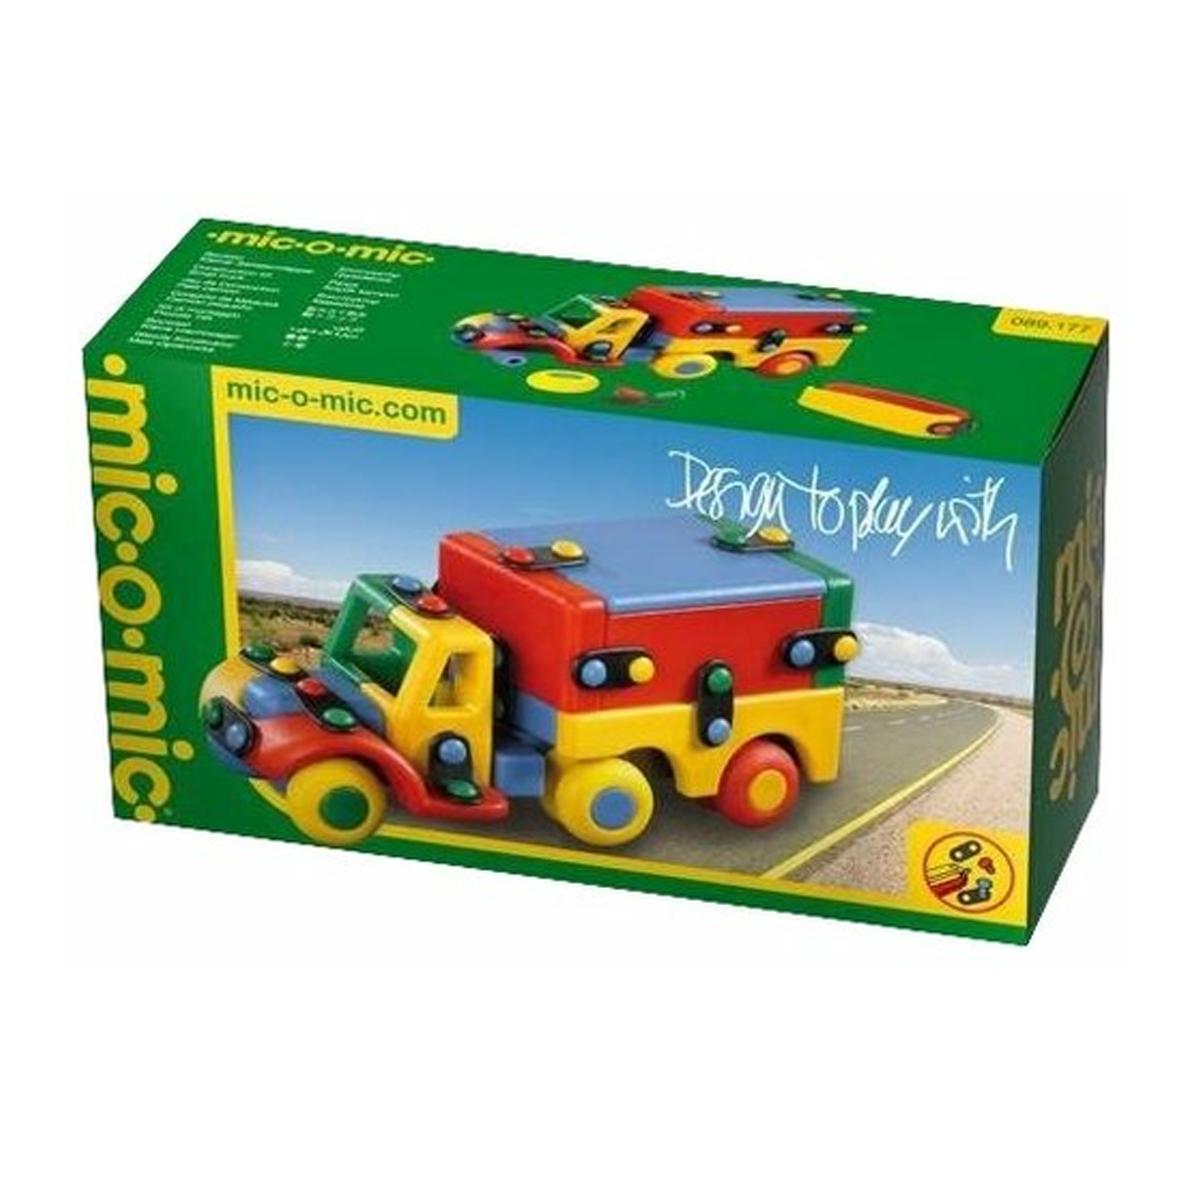 ساختنی مدل کامیون کد 089177 main 1 1